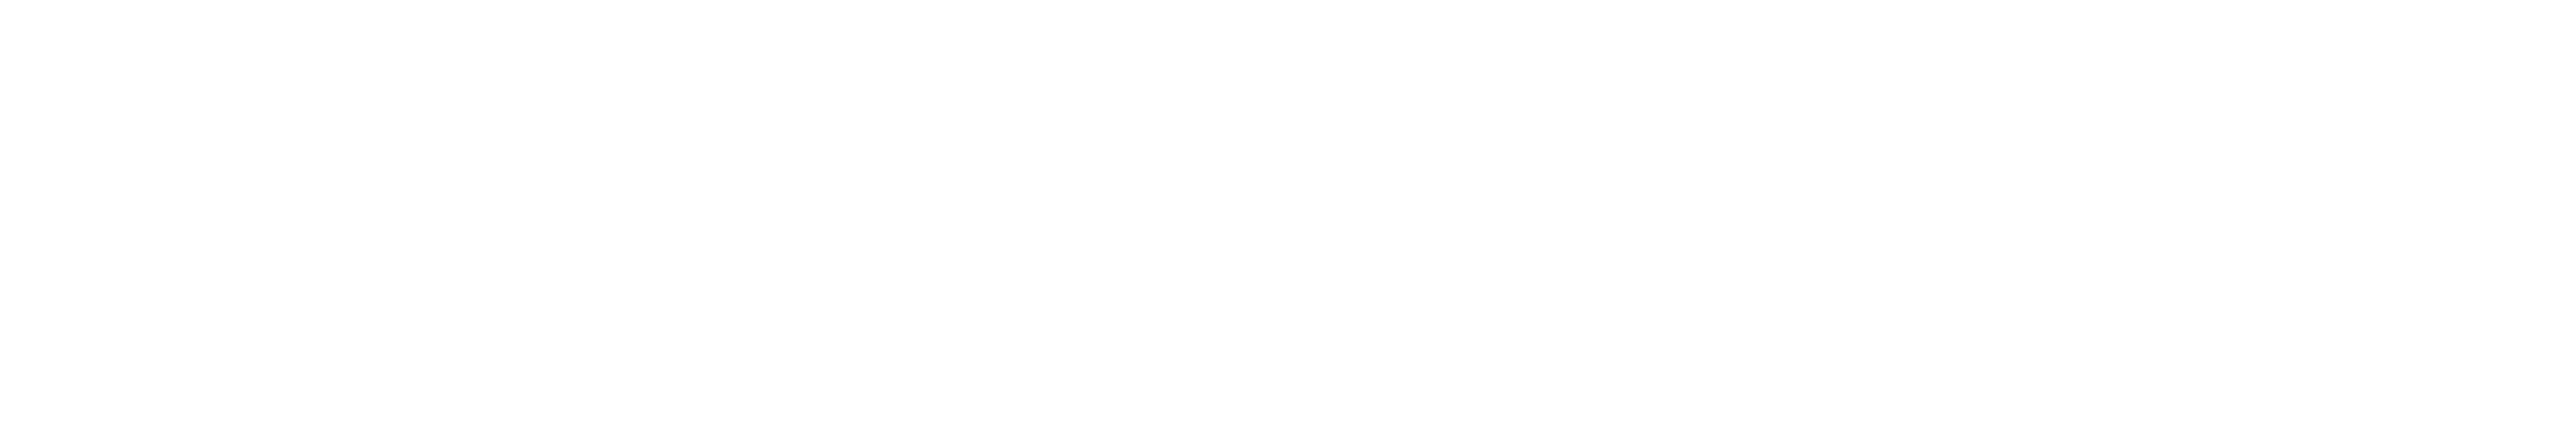 ebo_arabic_tagline